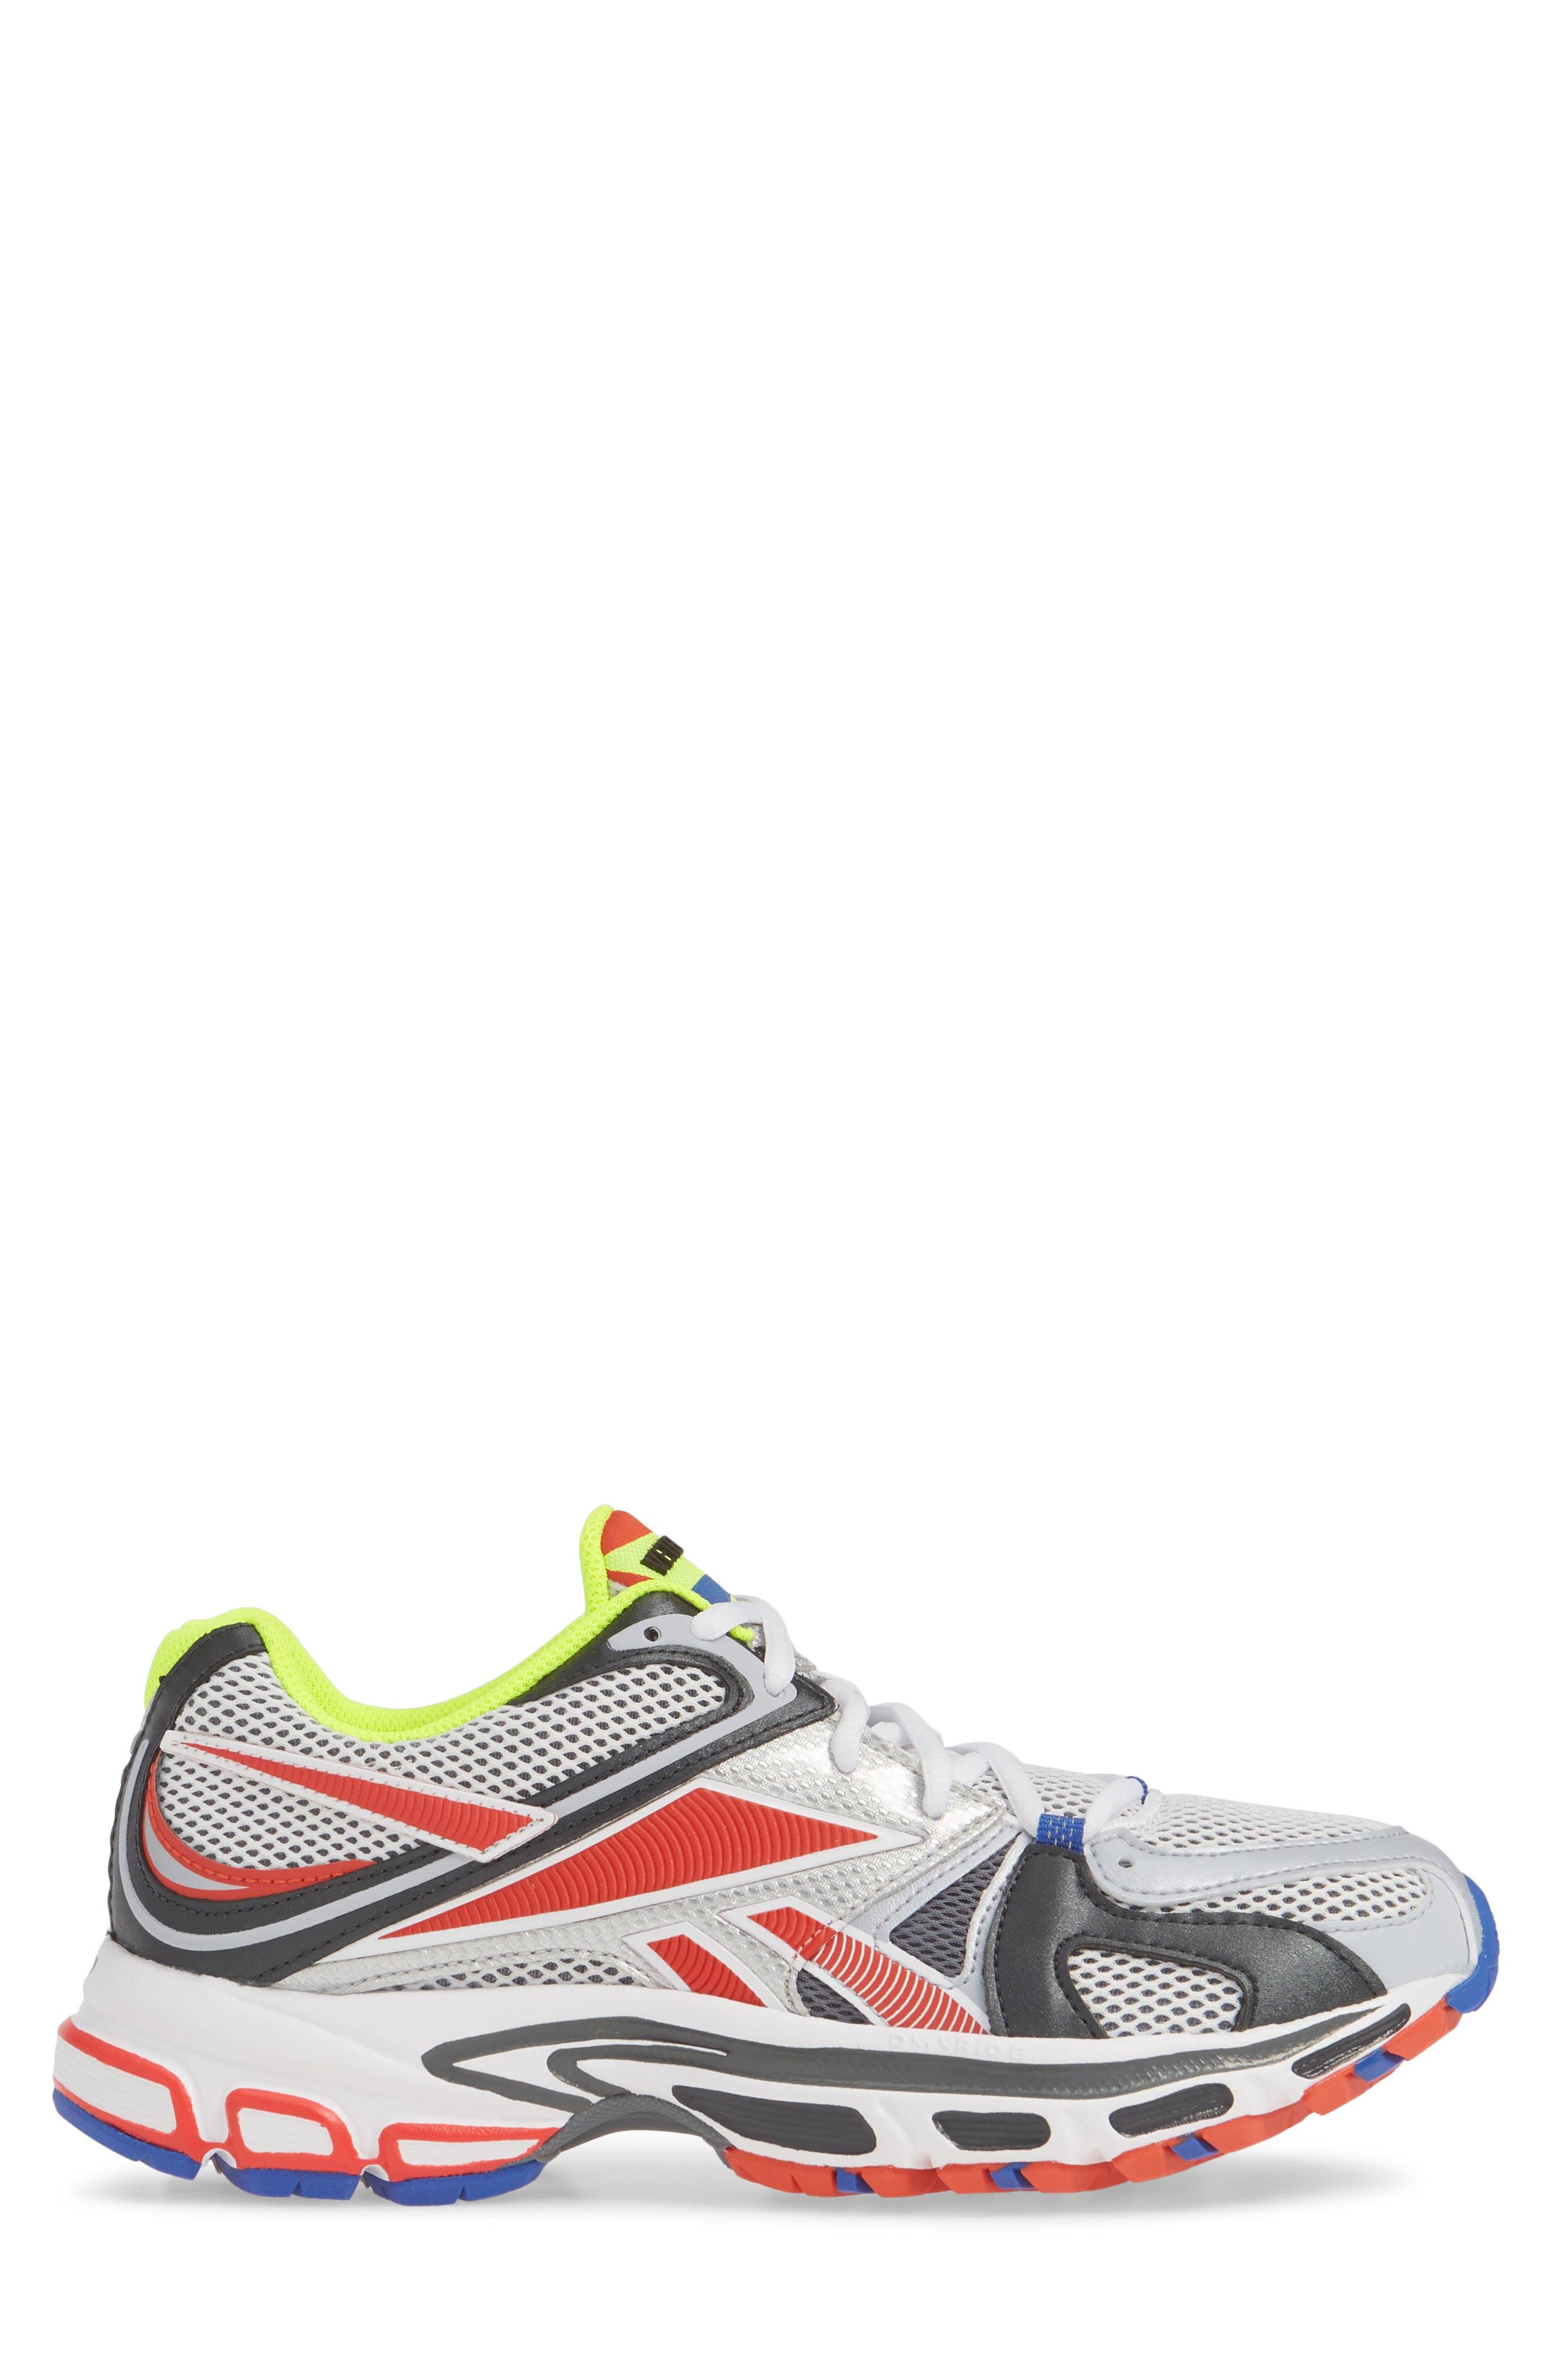 VETEMENTS, x Reebok Spike Runner 200 Sneaker, Alternate thumbnail 3, color, FLUO YELLOW